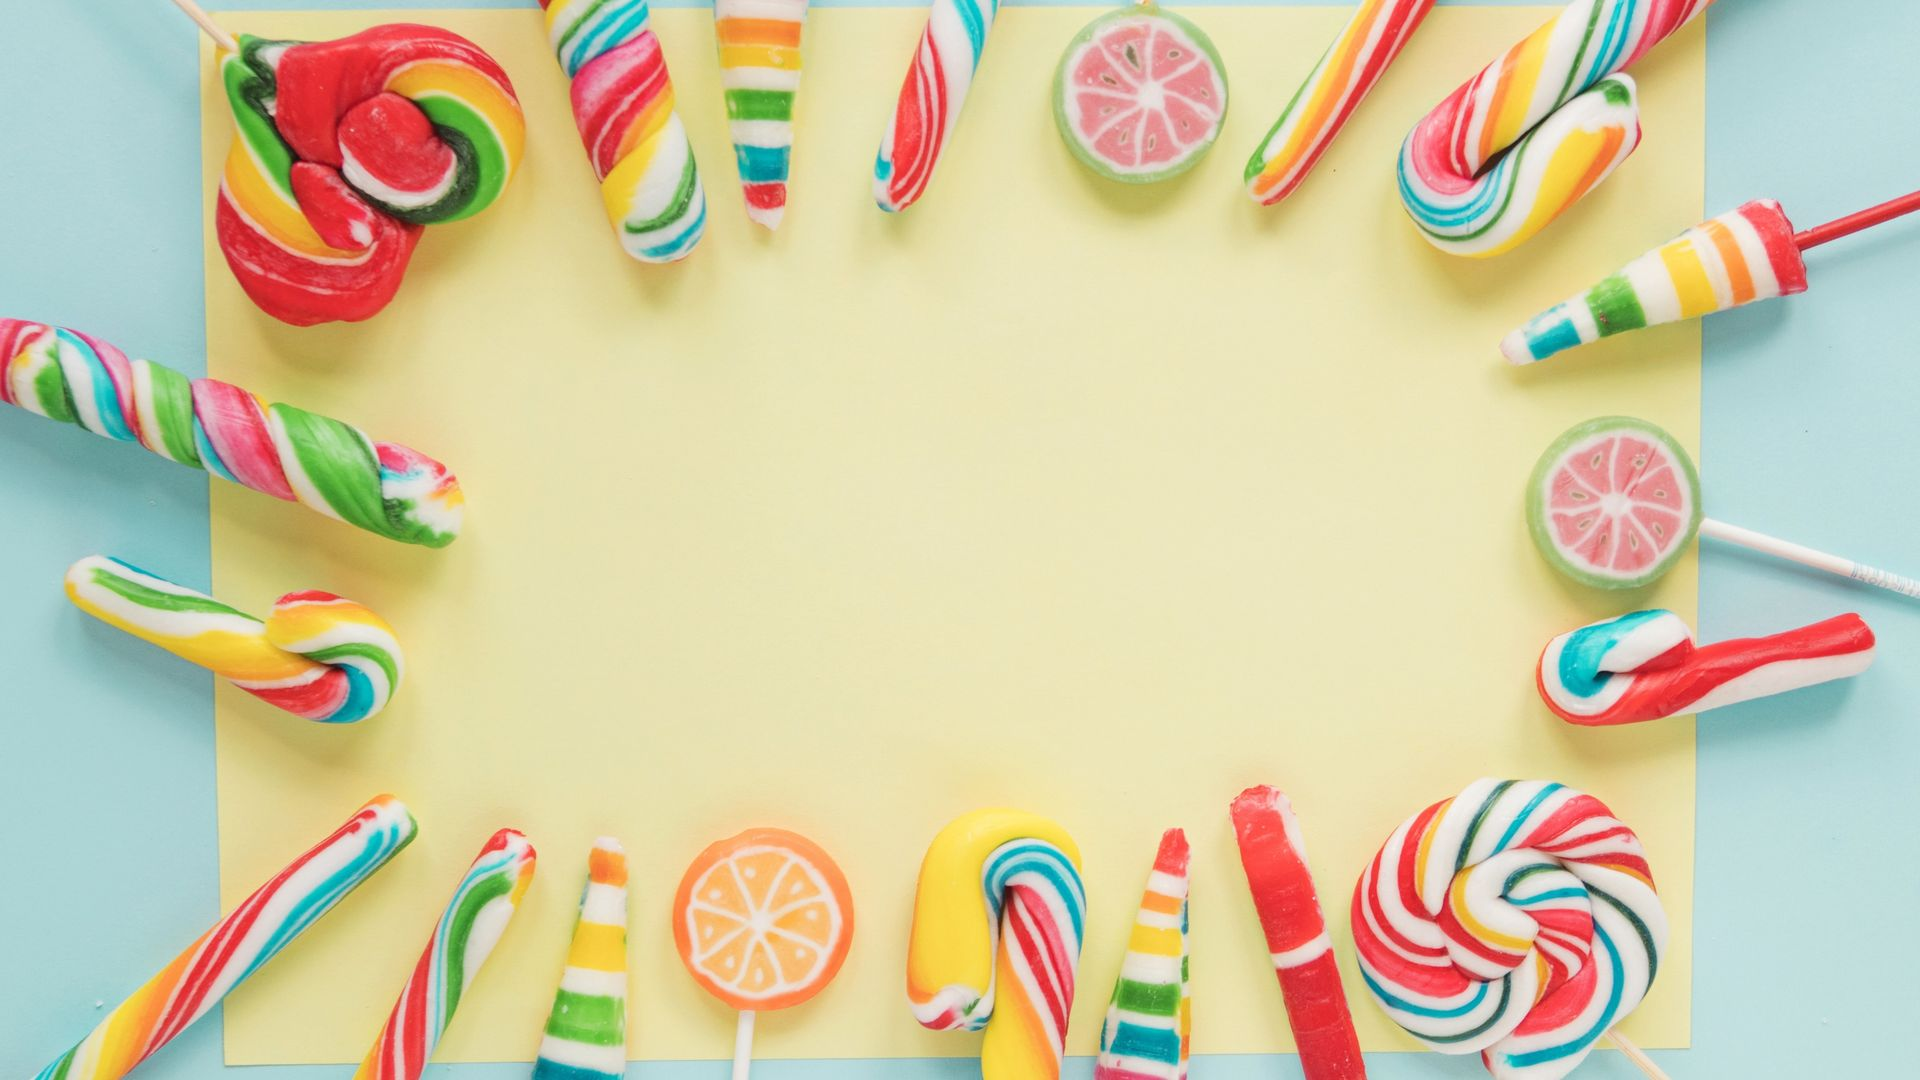 Candy Lollipops HD Wallpaper   Wallpaper Stream 1920x1080